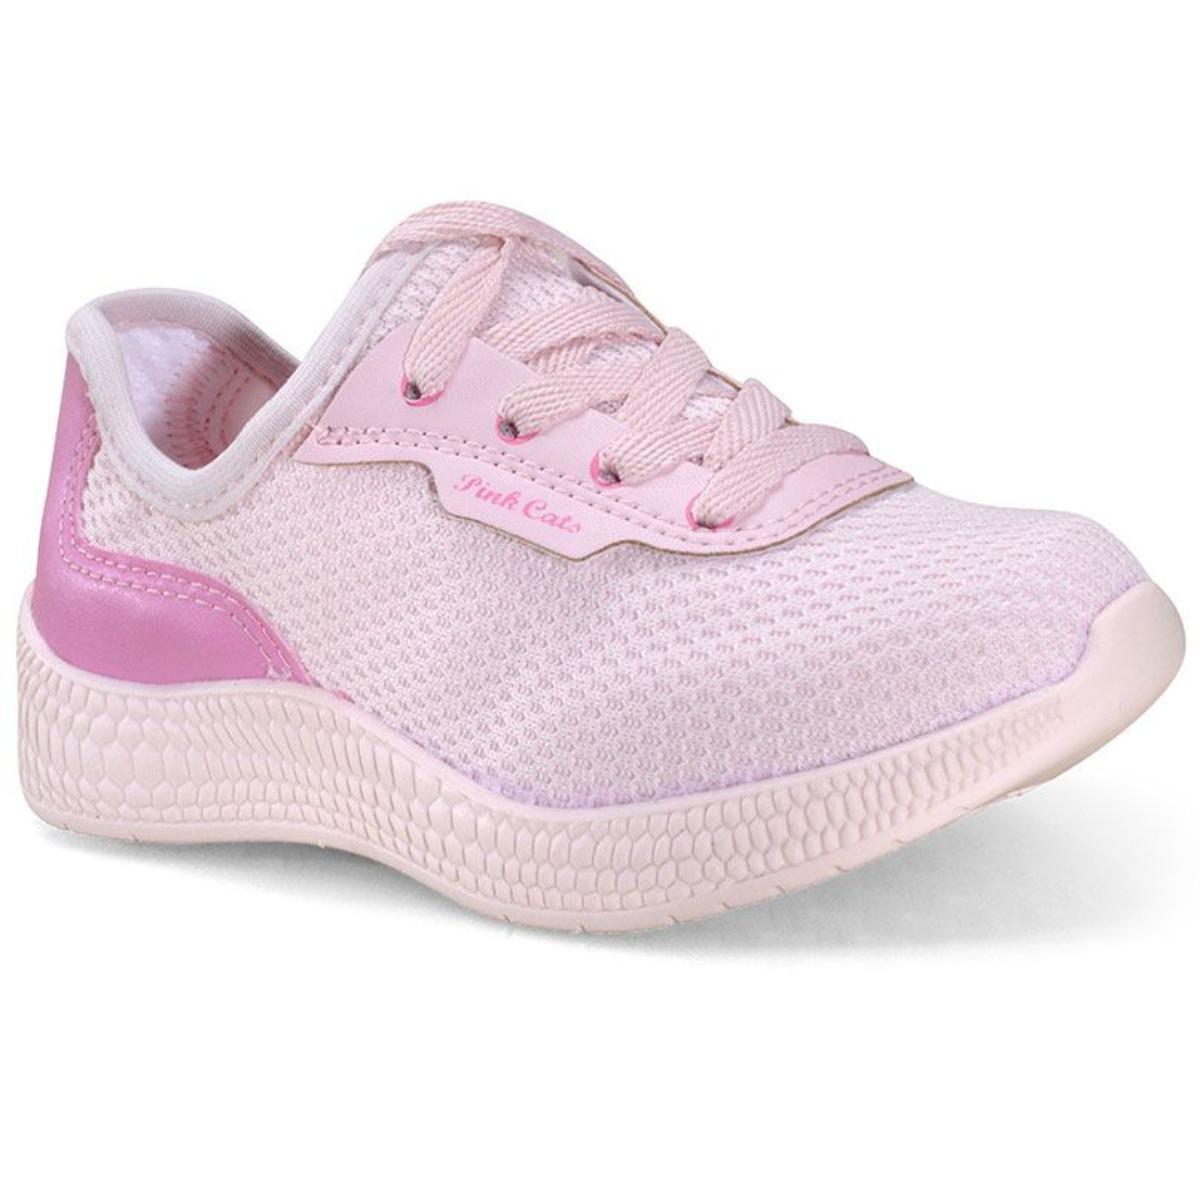 Tênis Fem Infantil Pink Cats V1951 Blush/pitaya